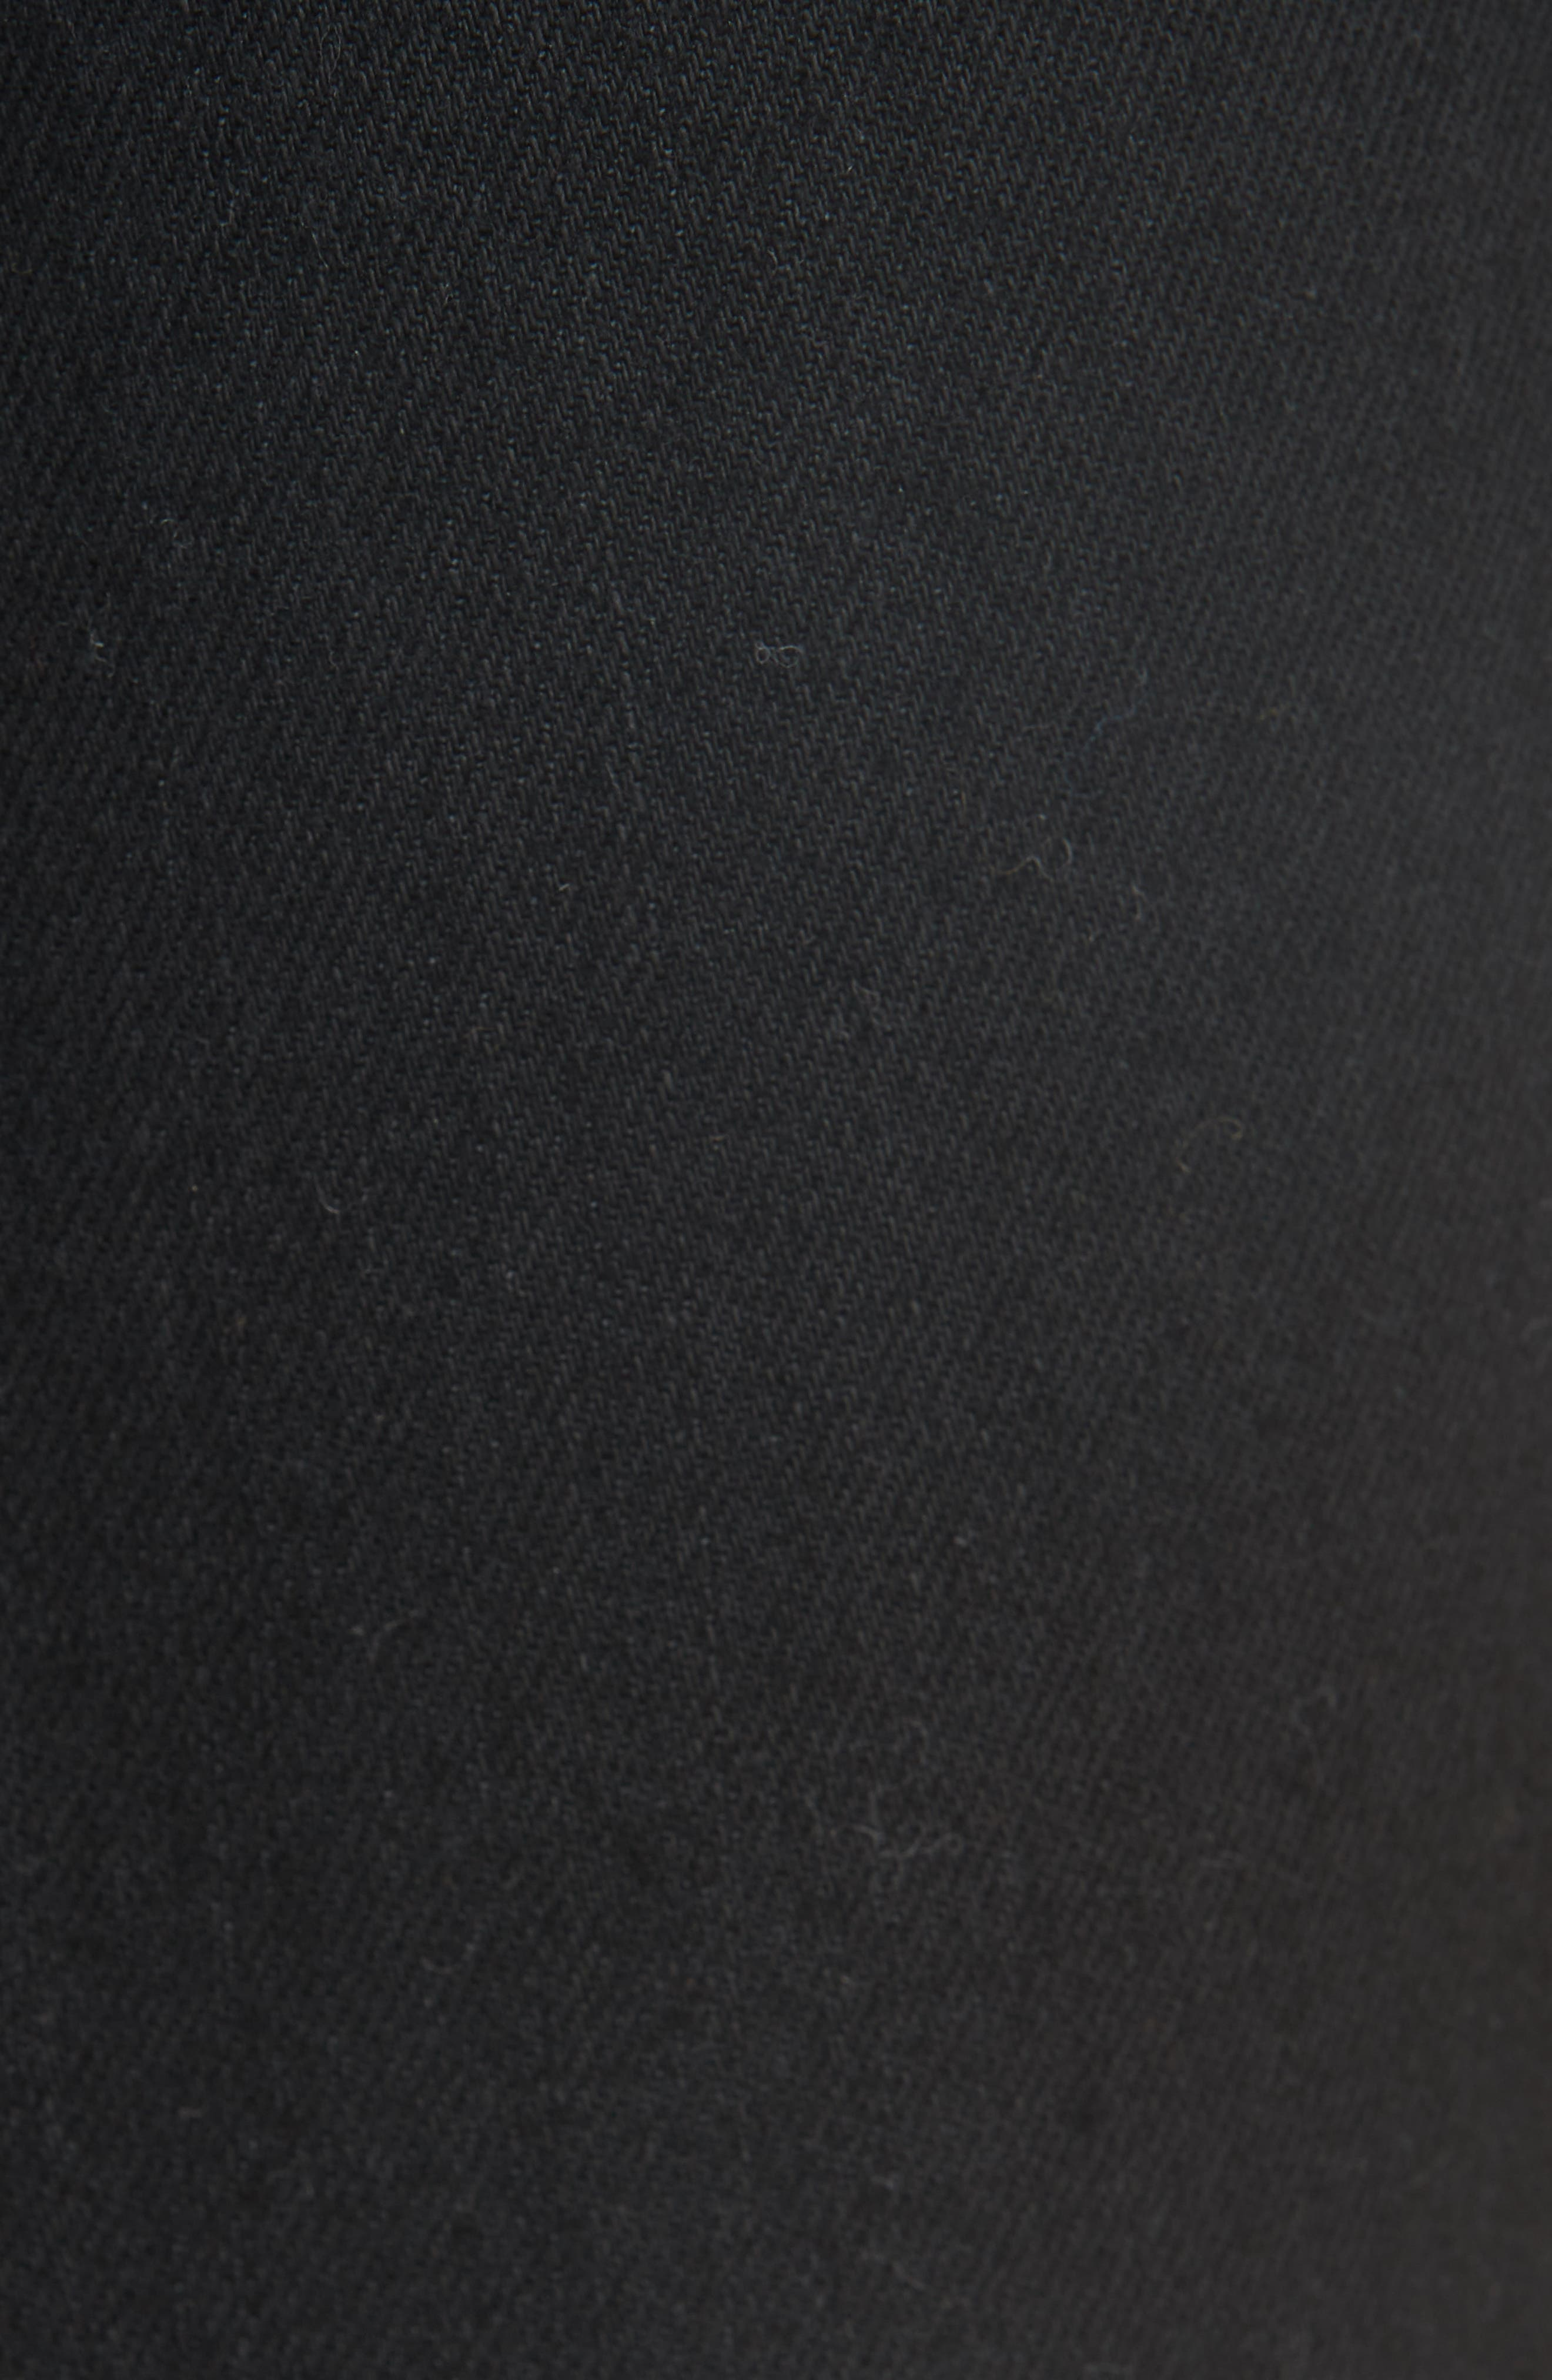 Patch Pocket Crop Flare Jeans,                             Alternate thumbnail 5, color,                             BLACK RINSE